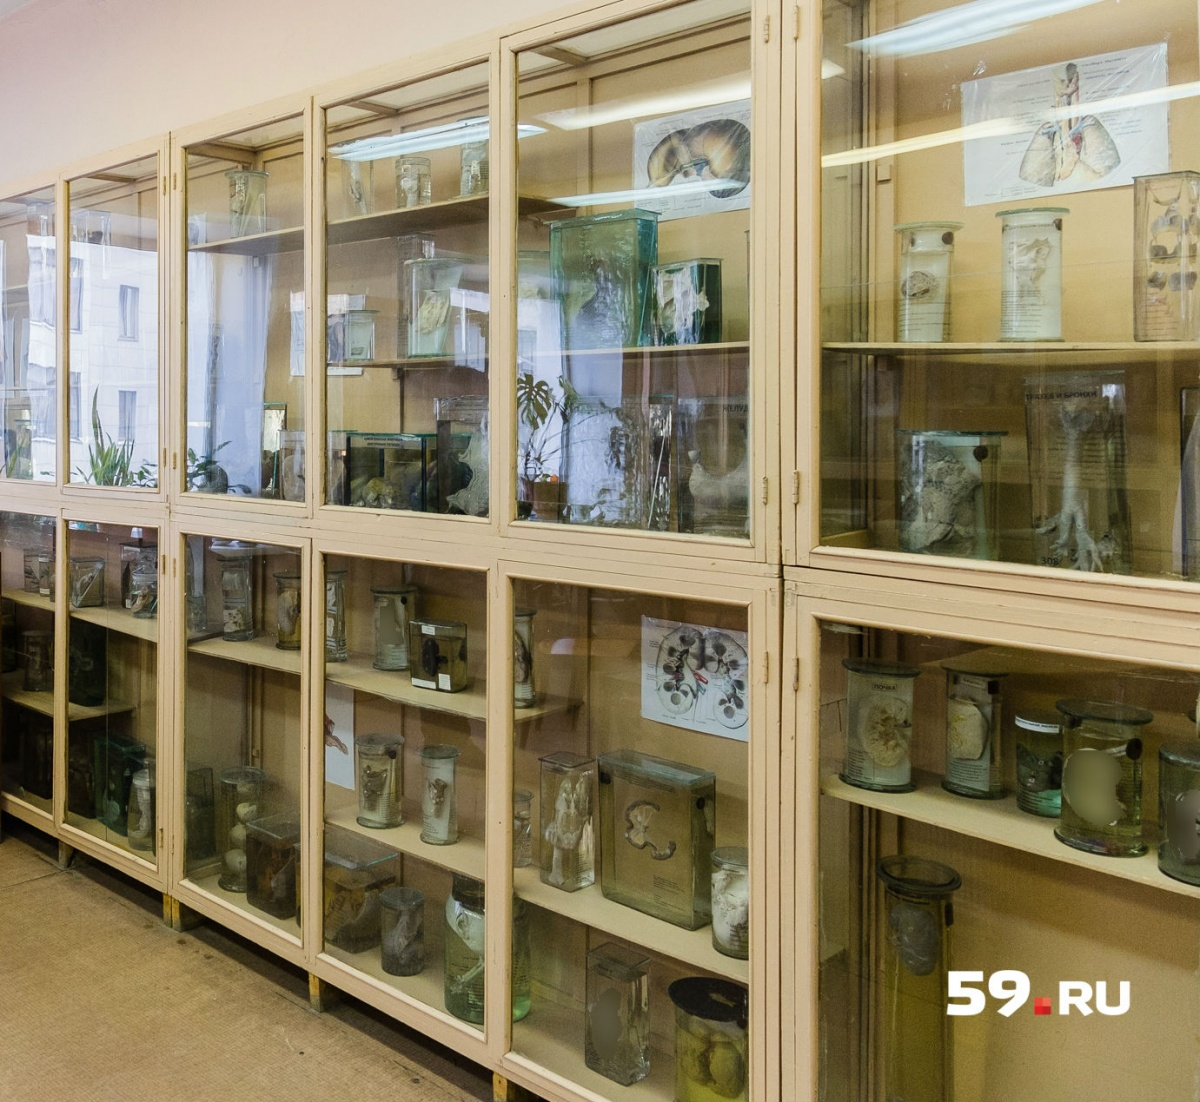 Сейчас залы, где хранятся препараты, называют не музеем, а экспозиционными комнатами